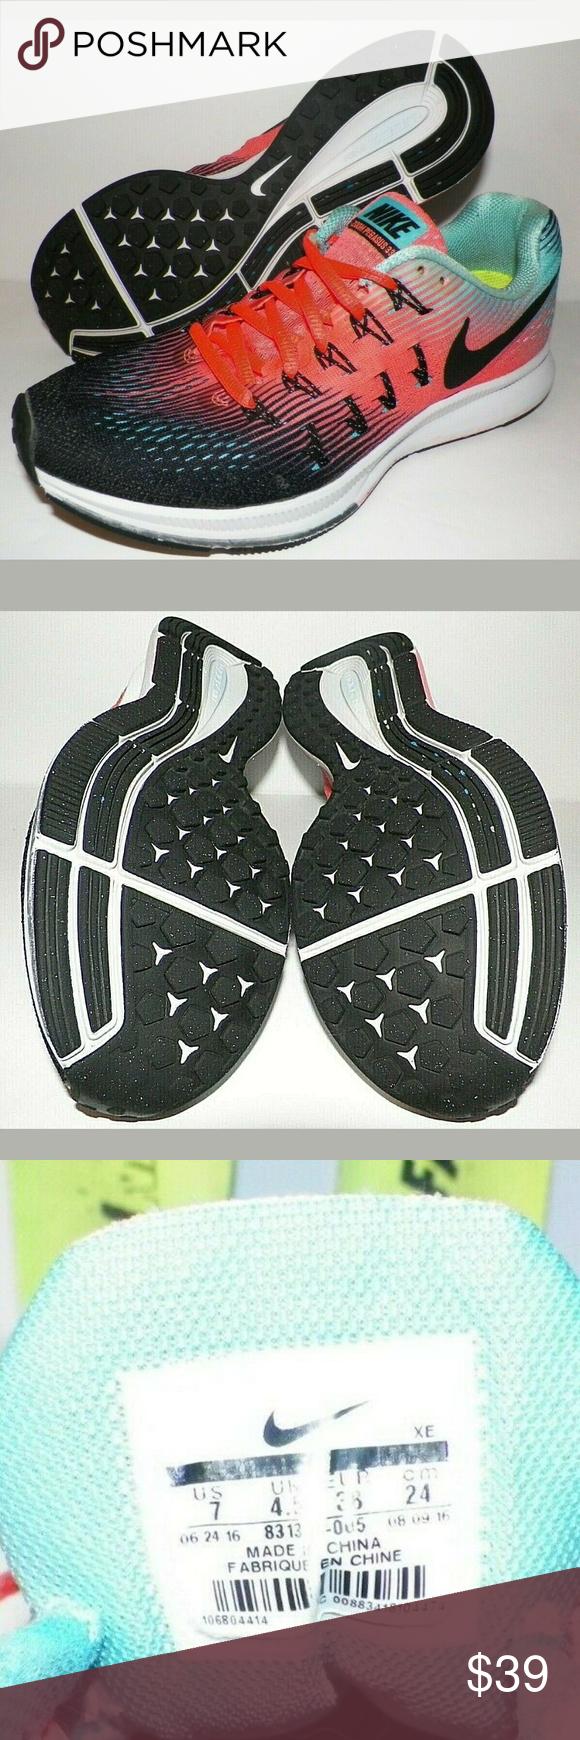 Women 7 Nike Air Zoom Pegasus Running Shoes Women's 7 Nike